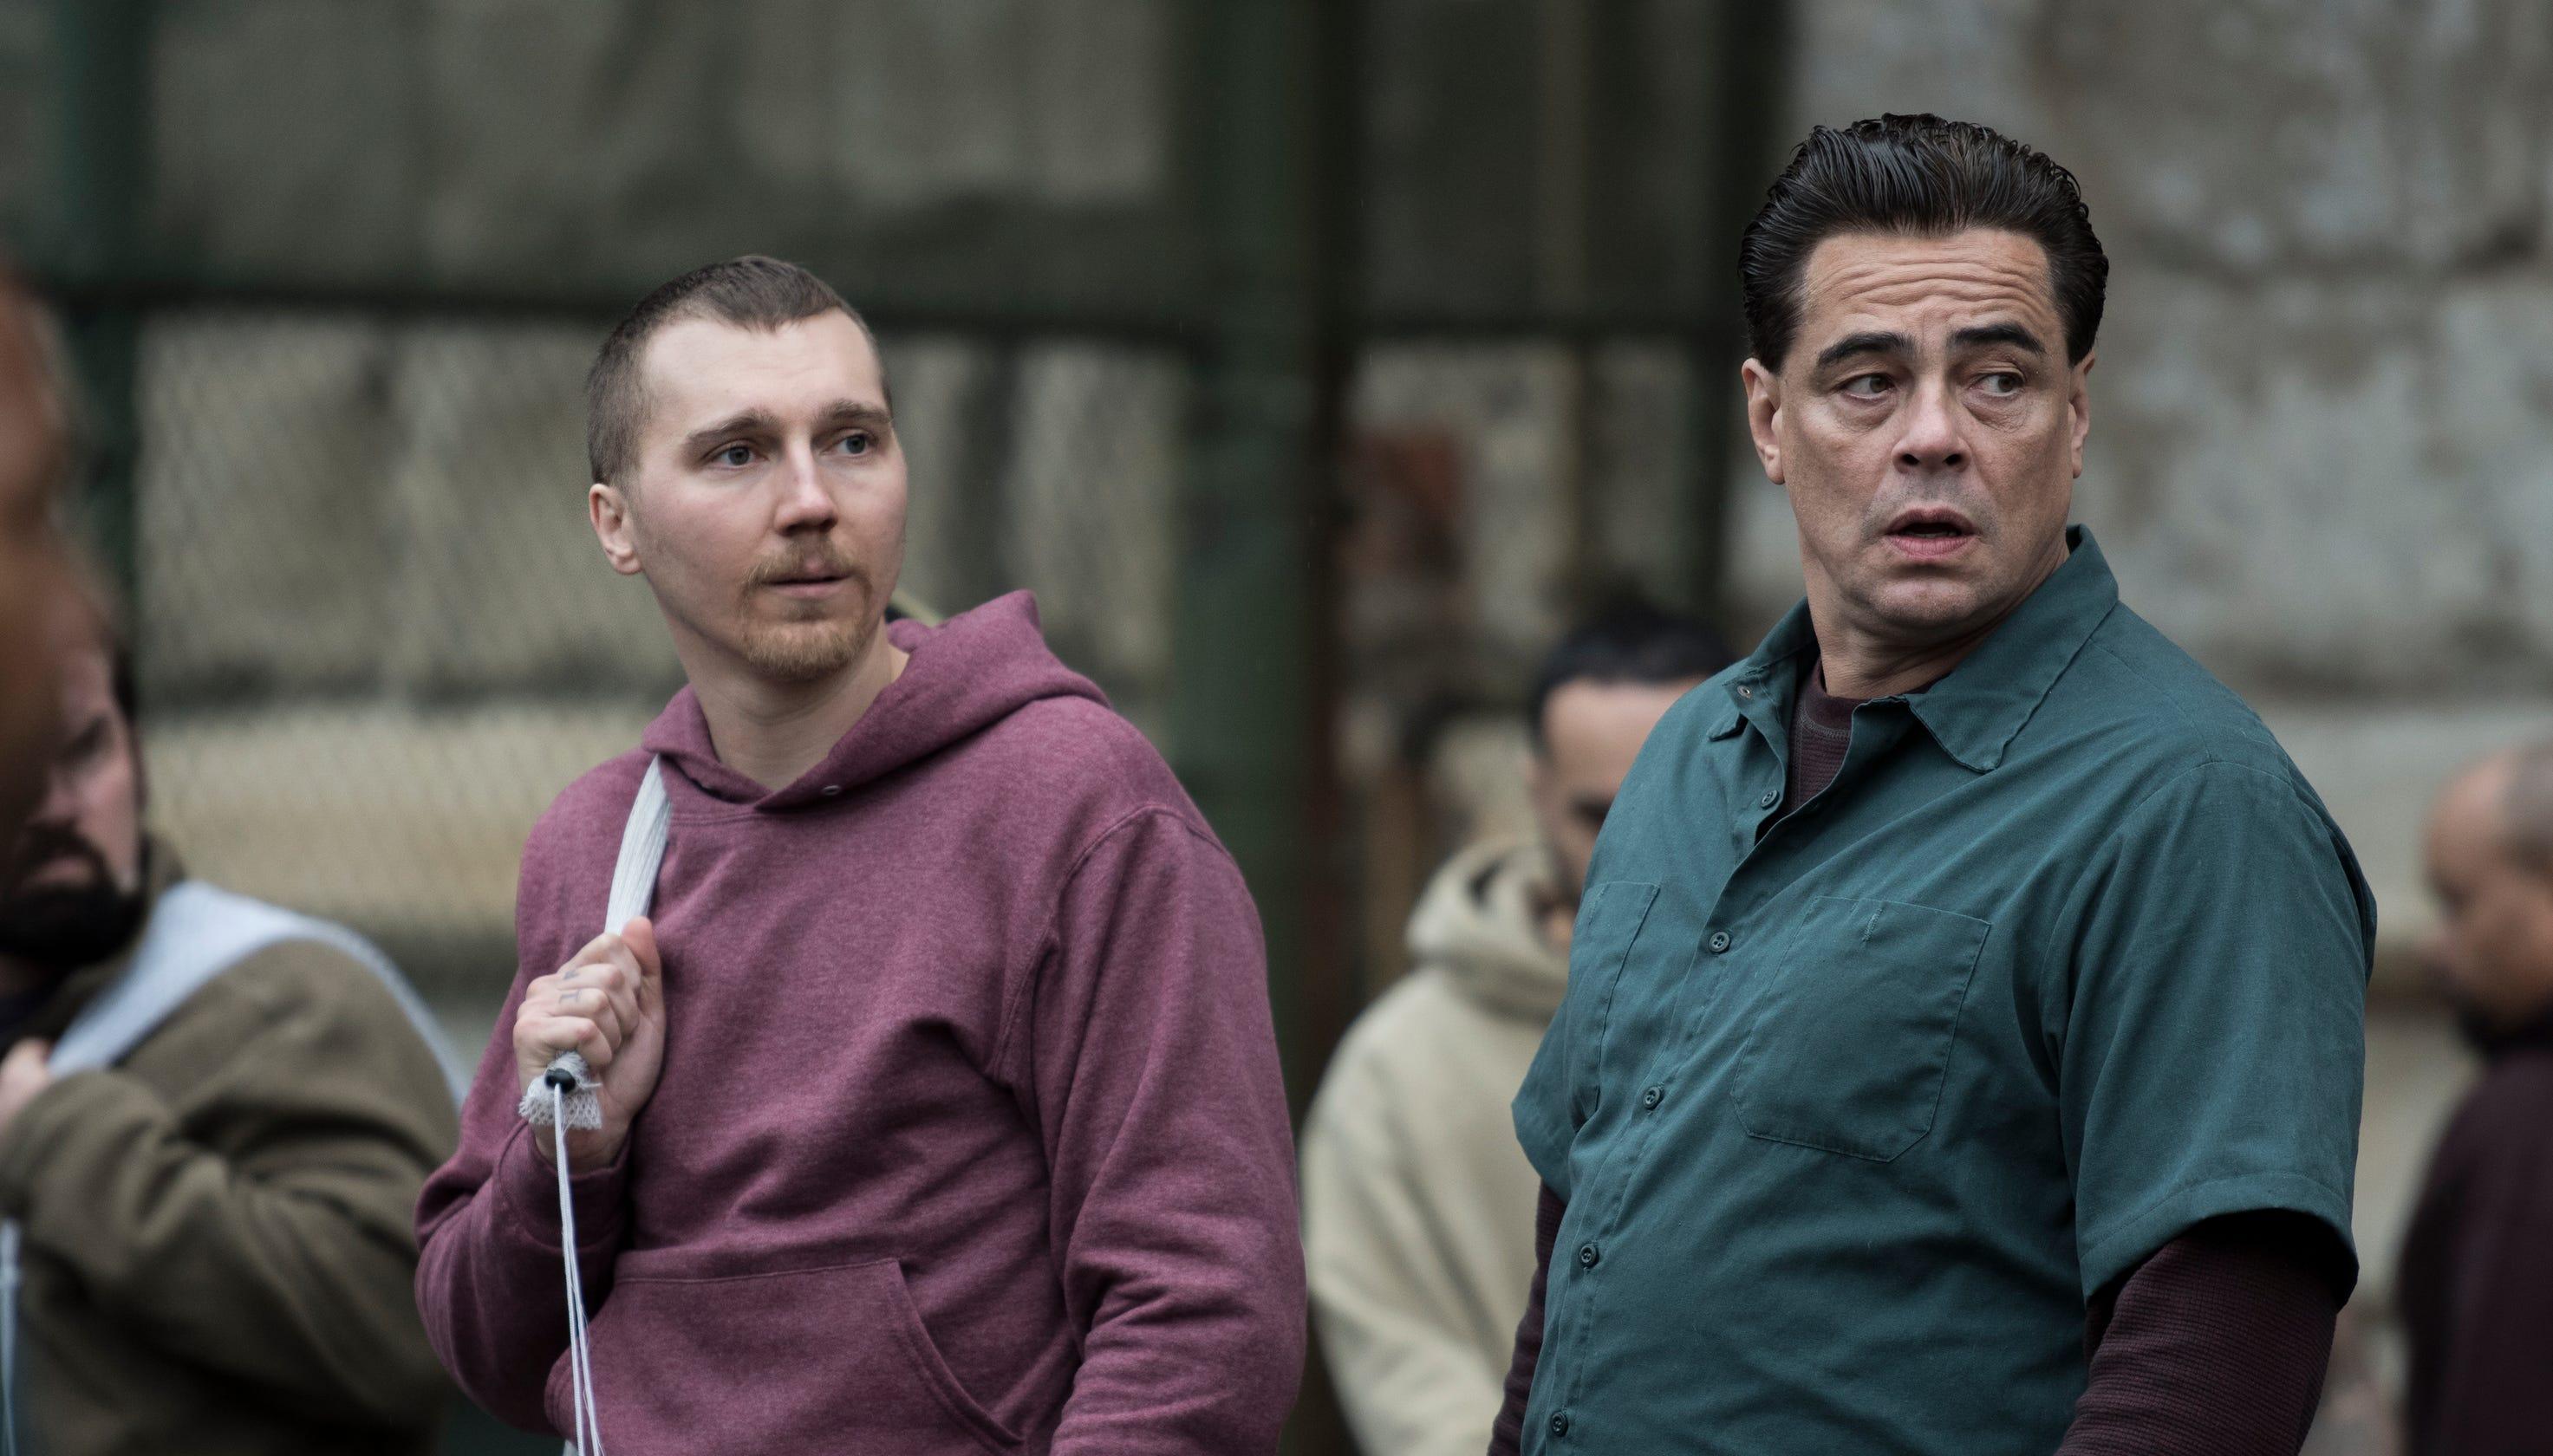 Prison-escape films and TV shows ranked, including 'Escape